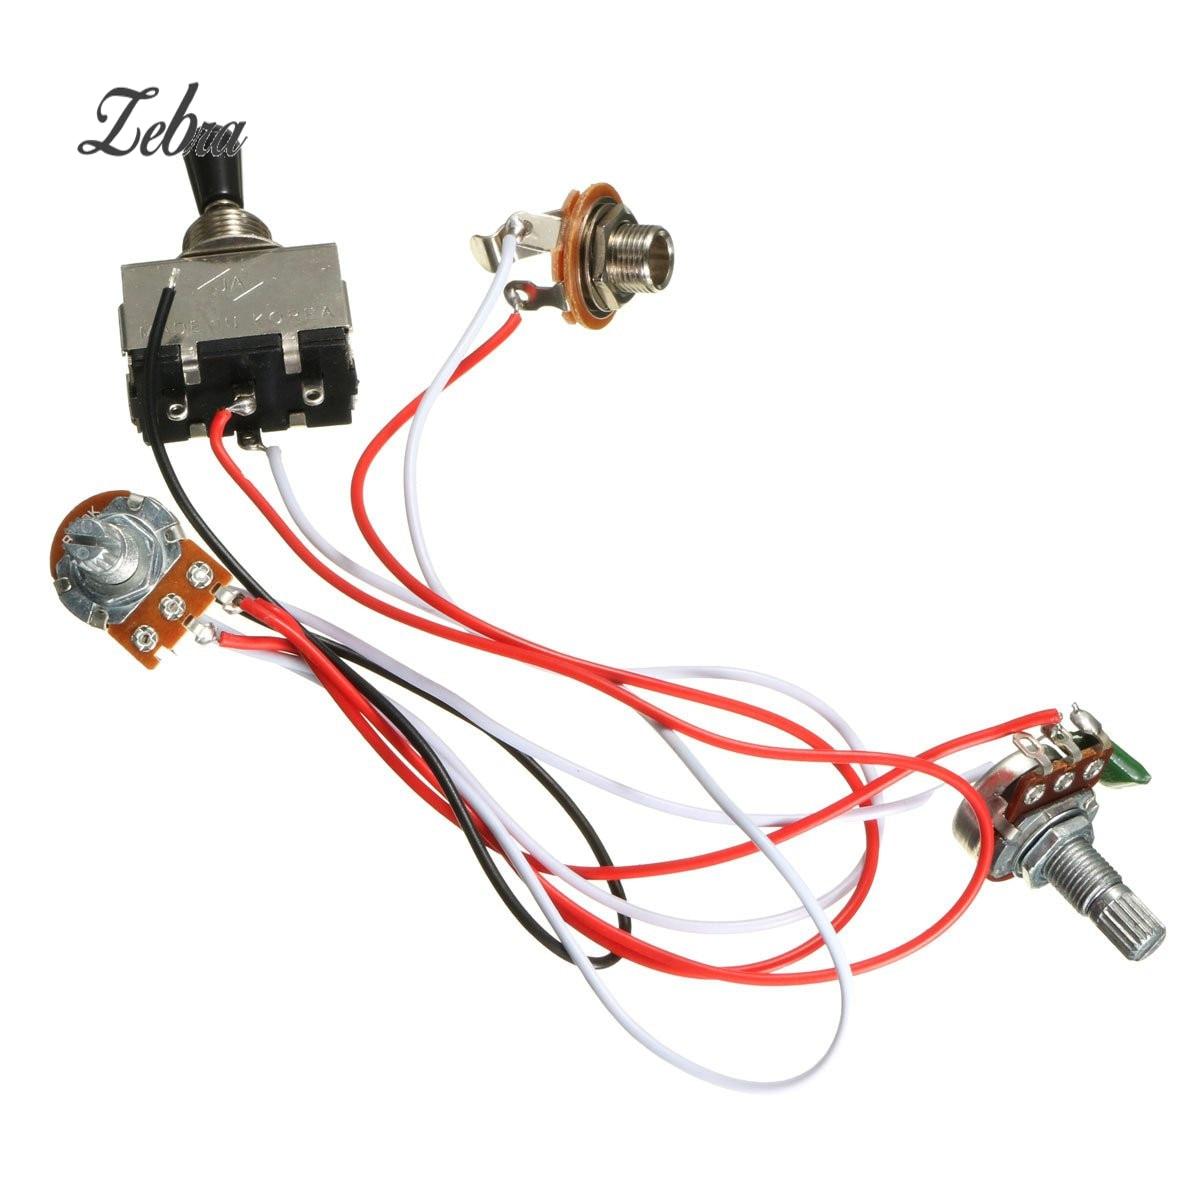 medium resolution of 3 pcs set metal plastic electric guitar sound switch guitar volume tone control shift wiring harness